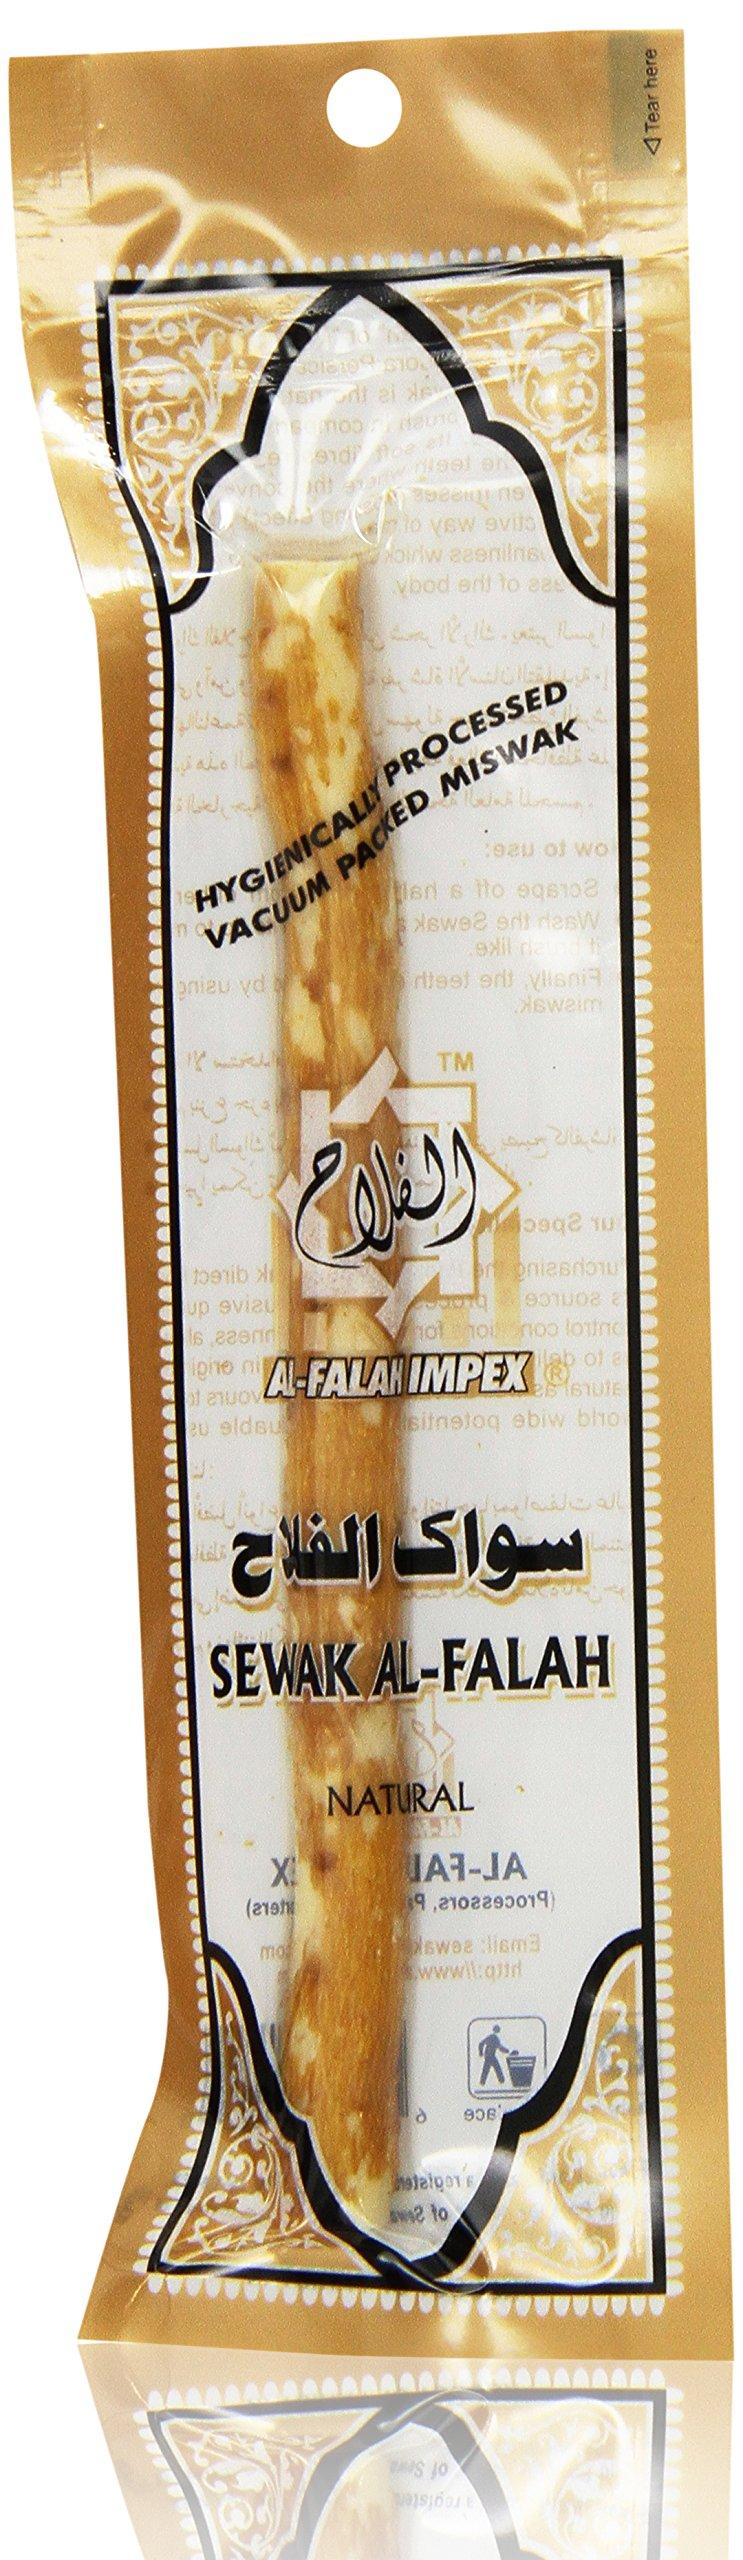 Miswak Stick - Sewak Al-Falah - Hygienically Processed and Vacummed Packed - Box of 60 Individual Sticks